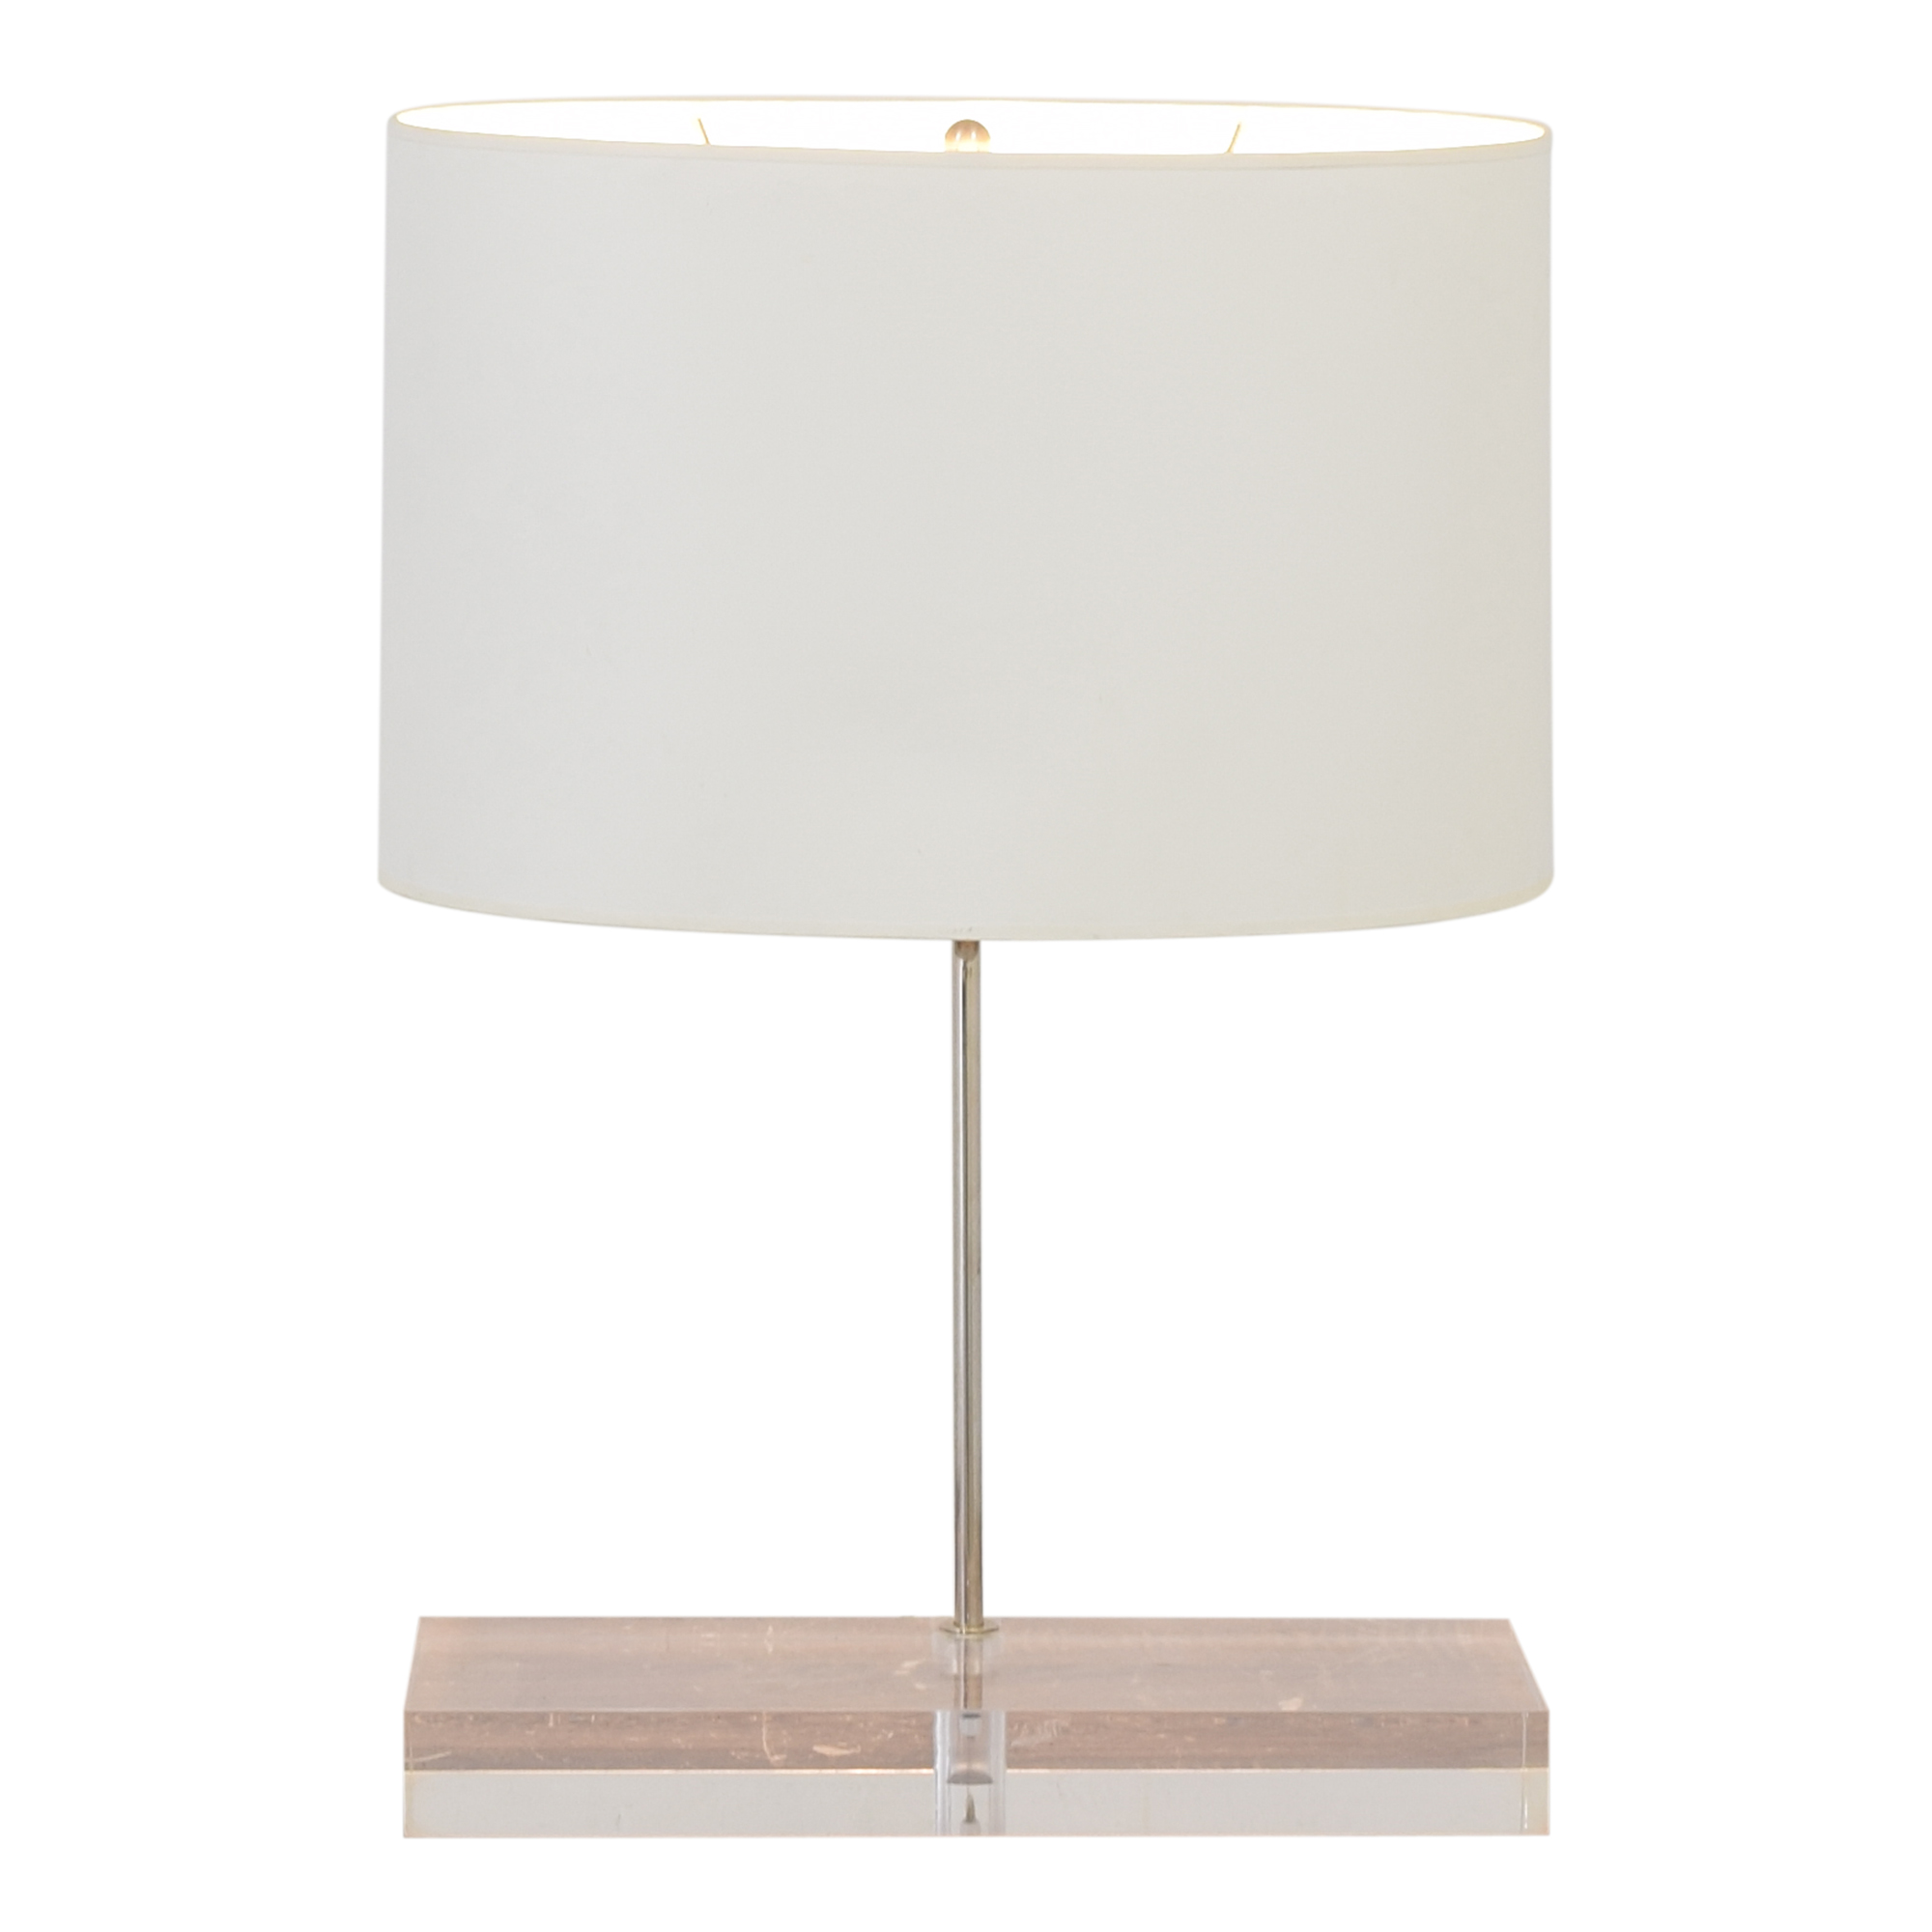 shop Jonathan Adler Modern Acrylic Table Lamp Jonathan Adler Decor